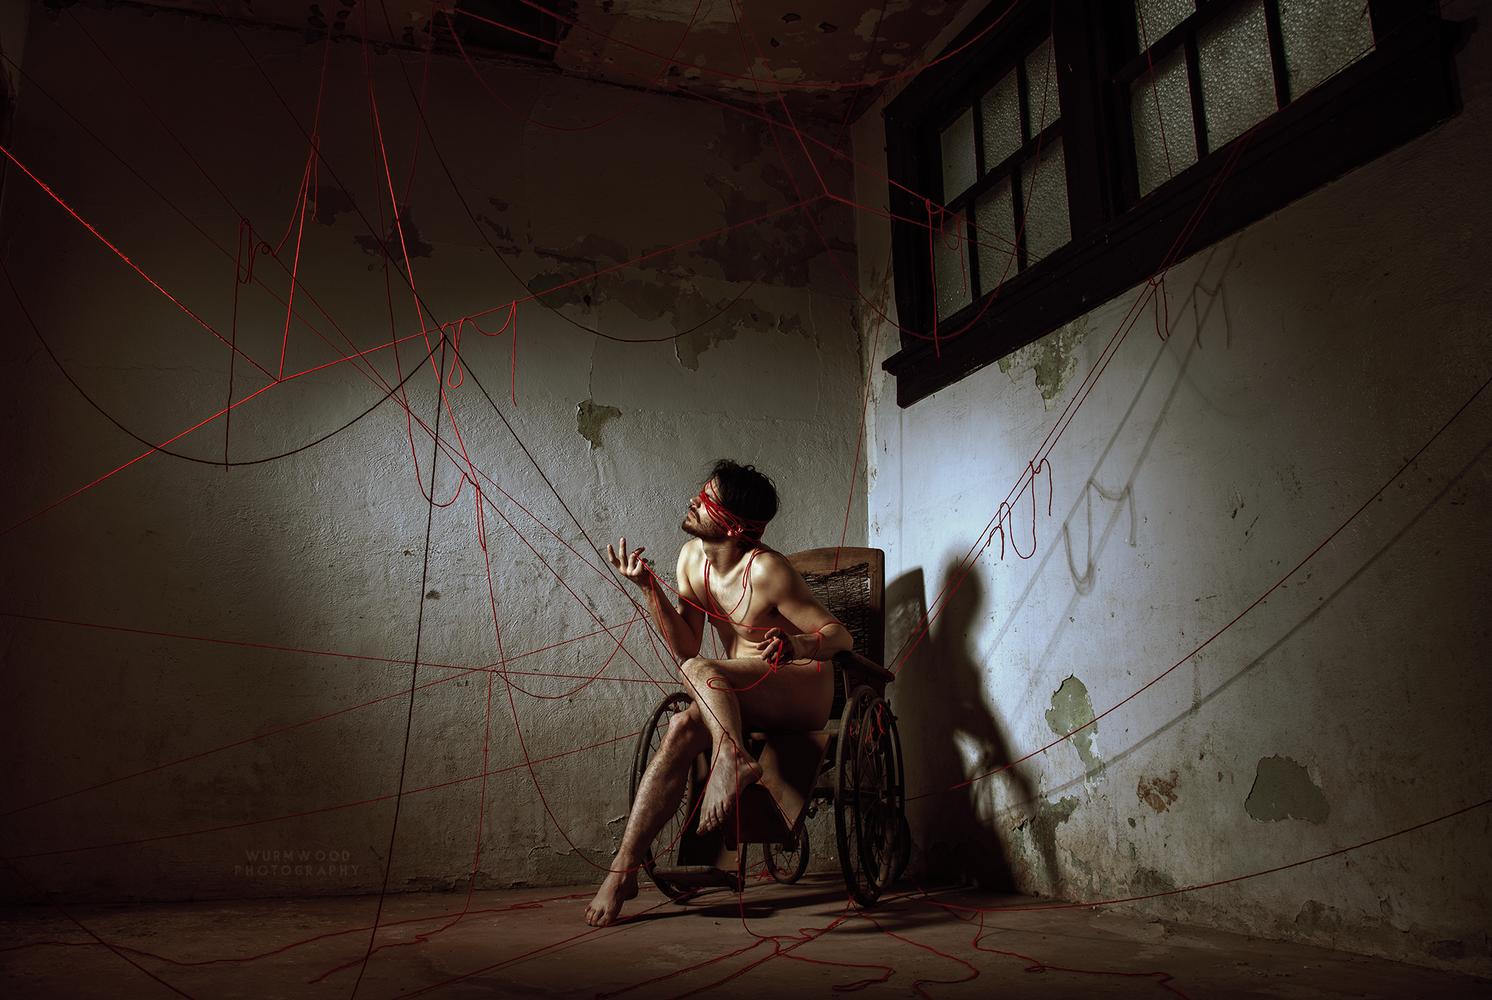 The Frail by Jess Hess